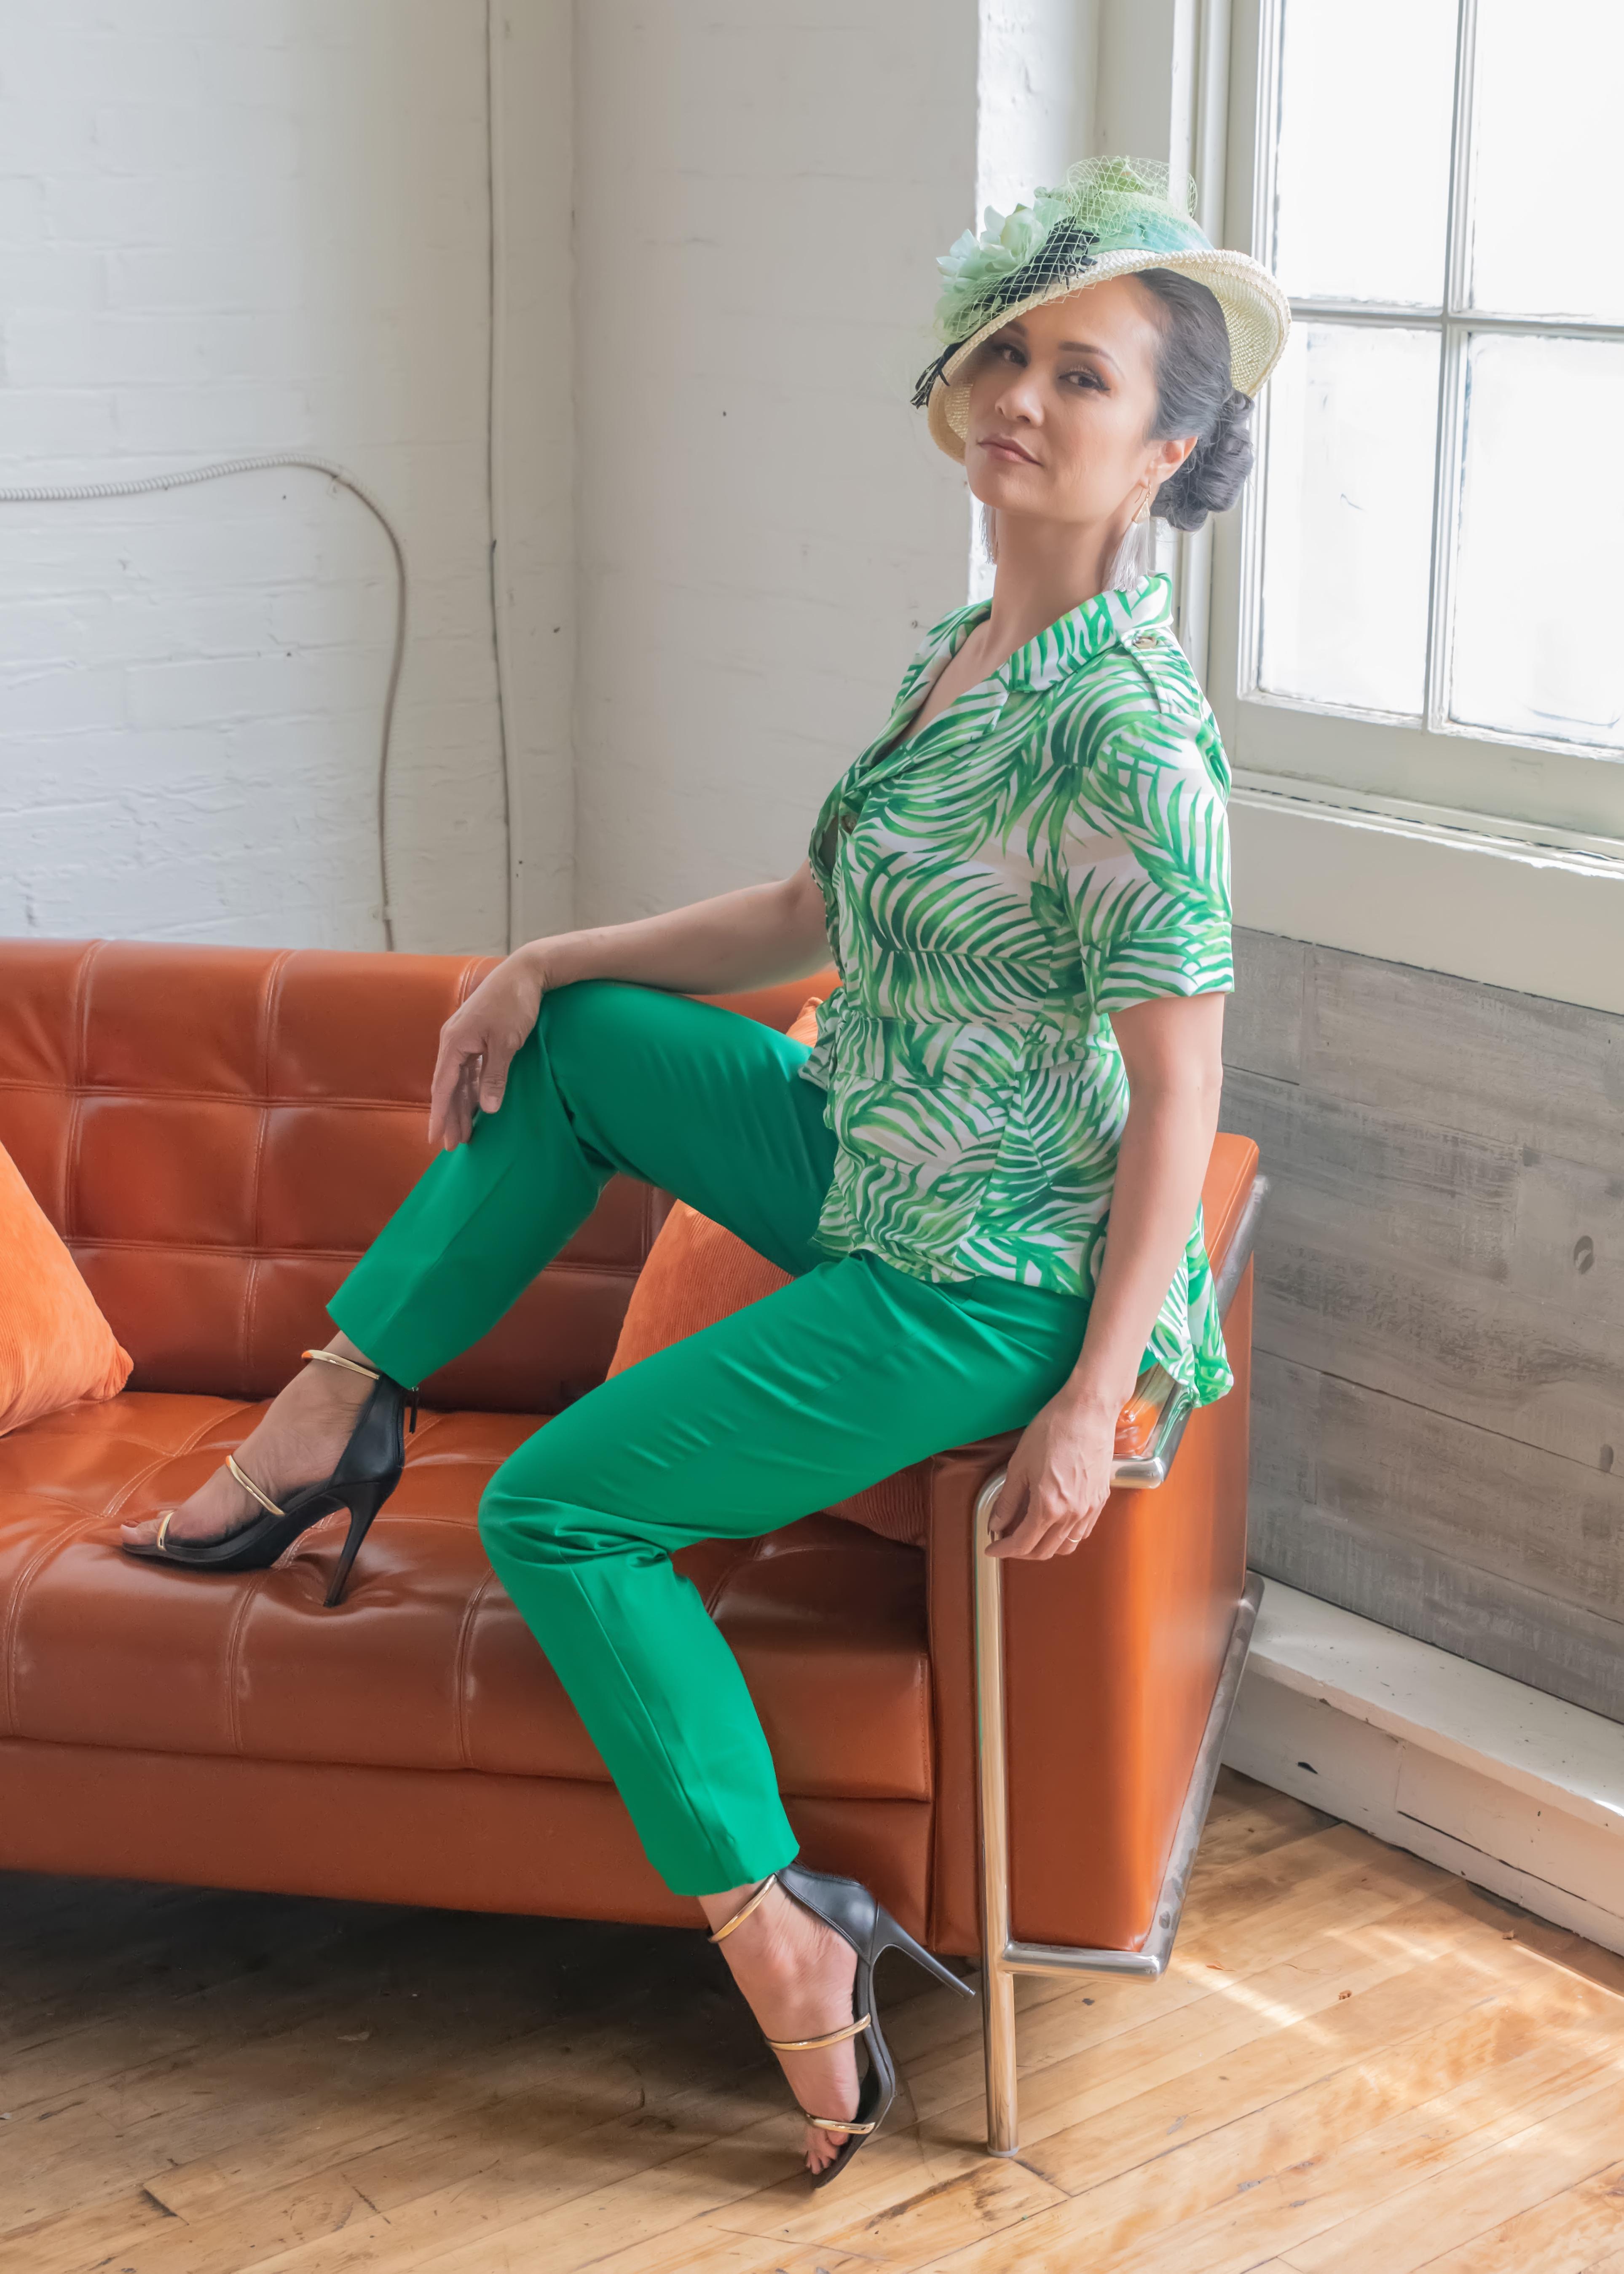 Palm Paradise Model Lani Dee sporting a chic vivid green ensemble and custom hat